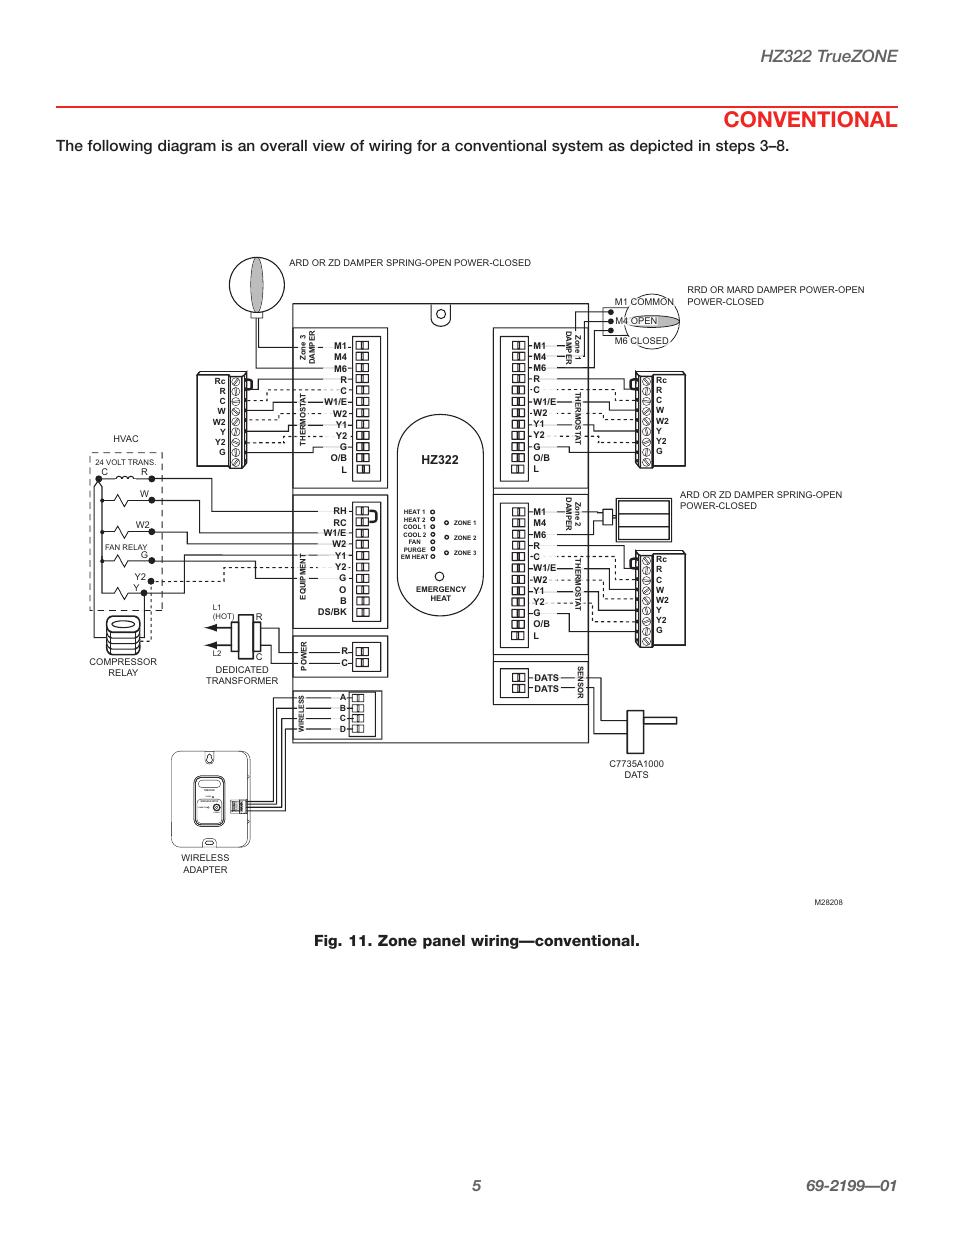 hz honeywell zone board wiring diagram on